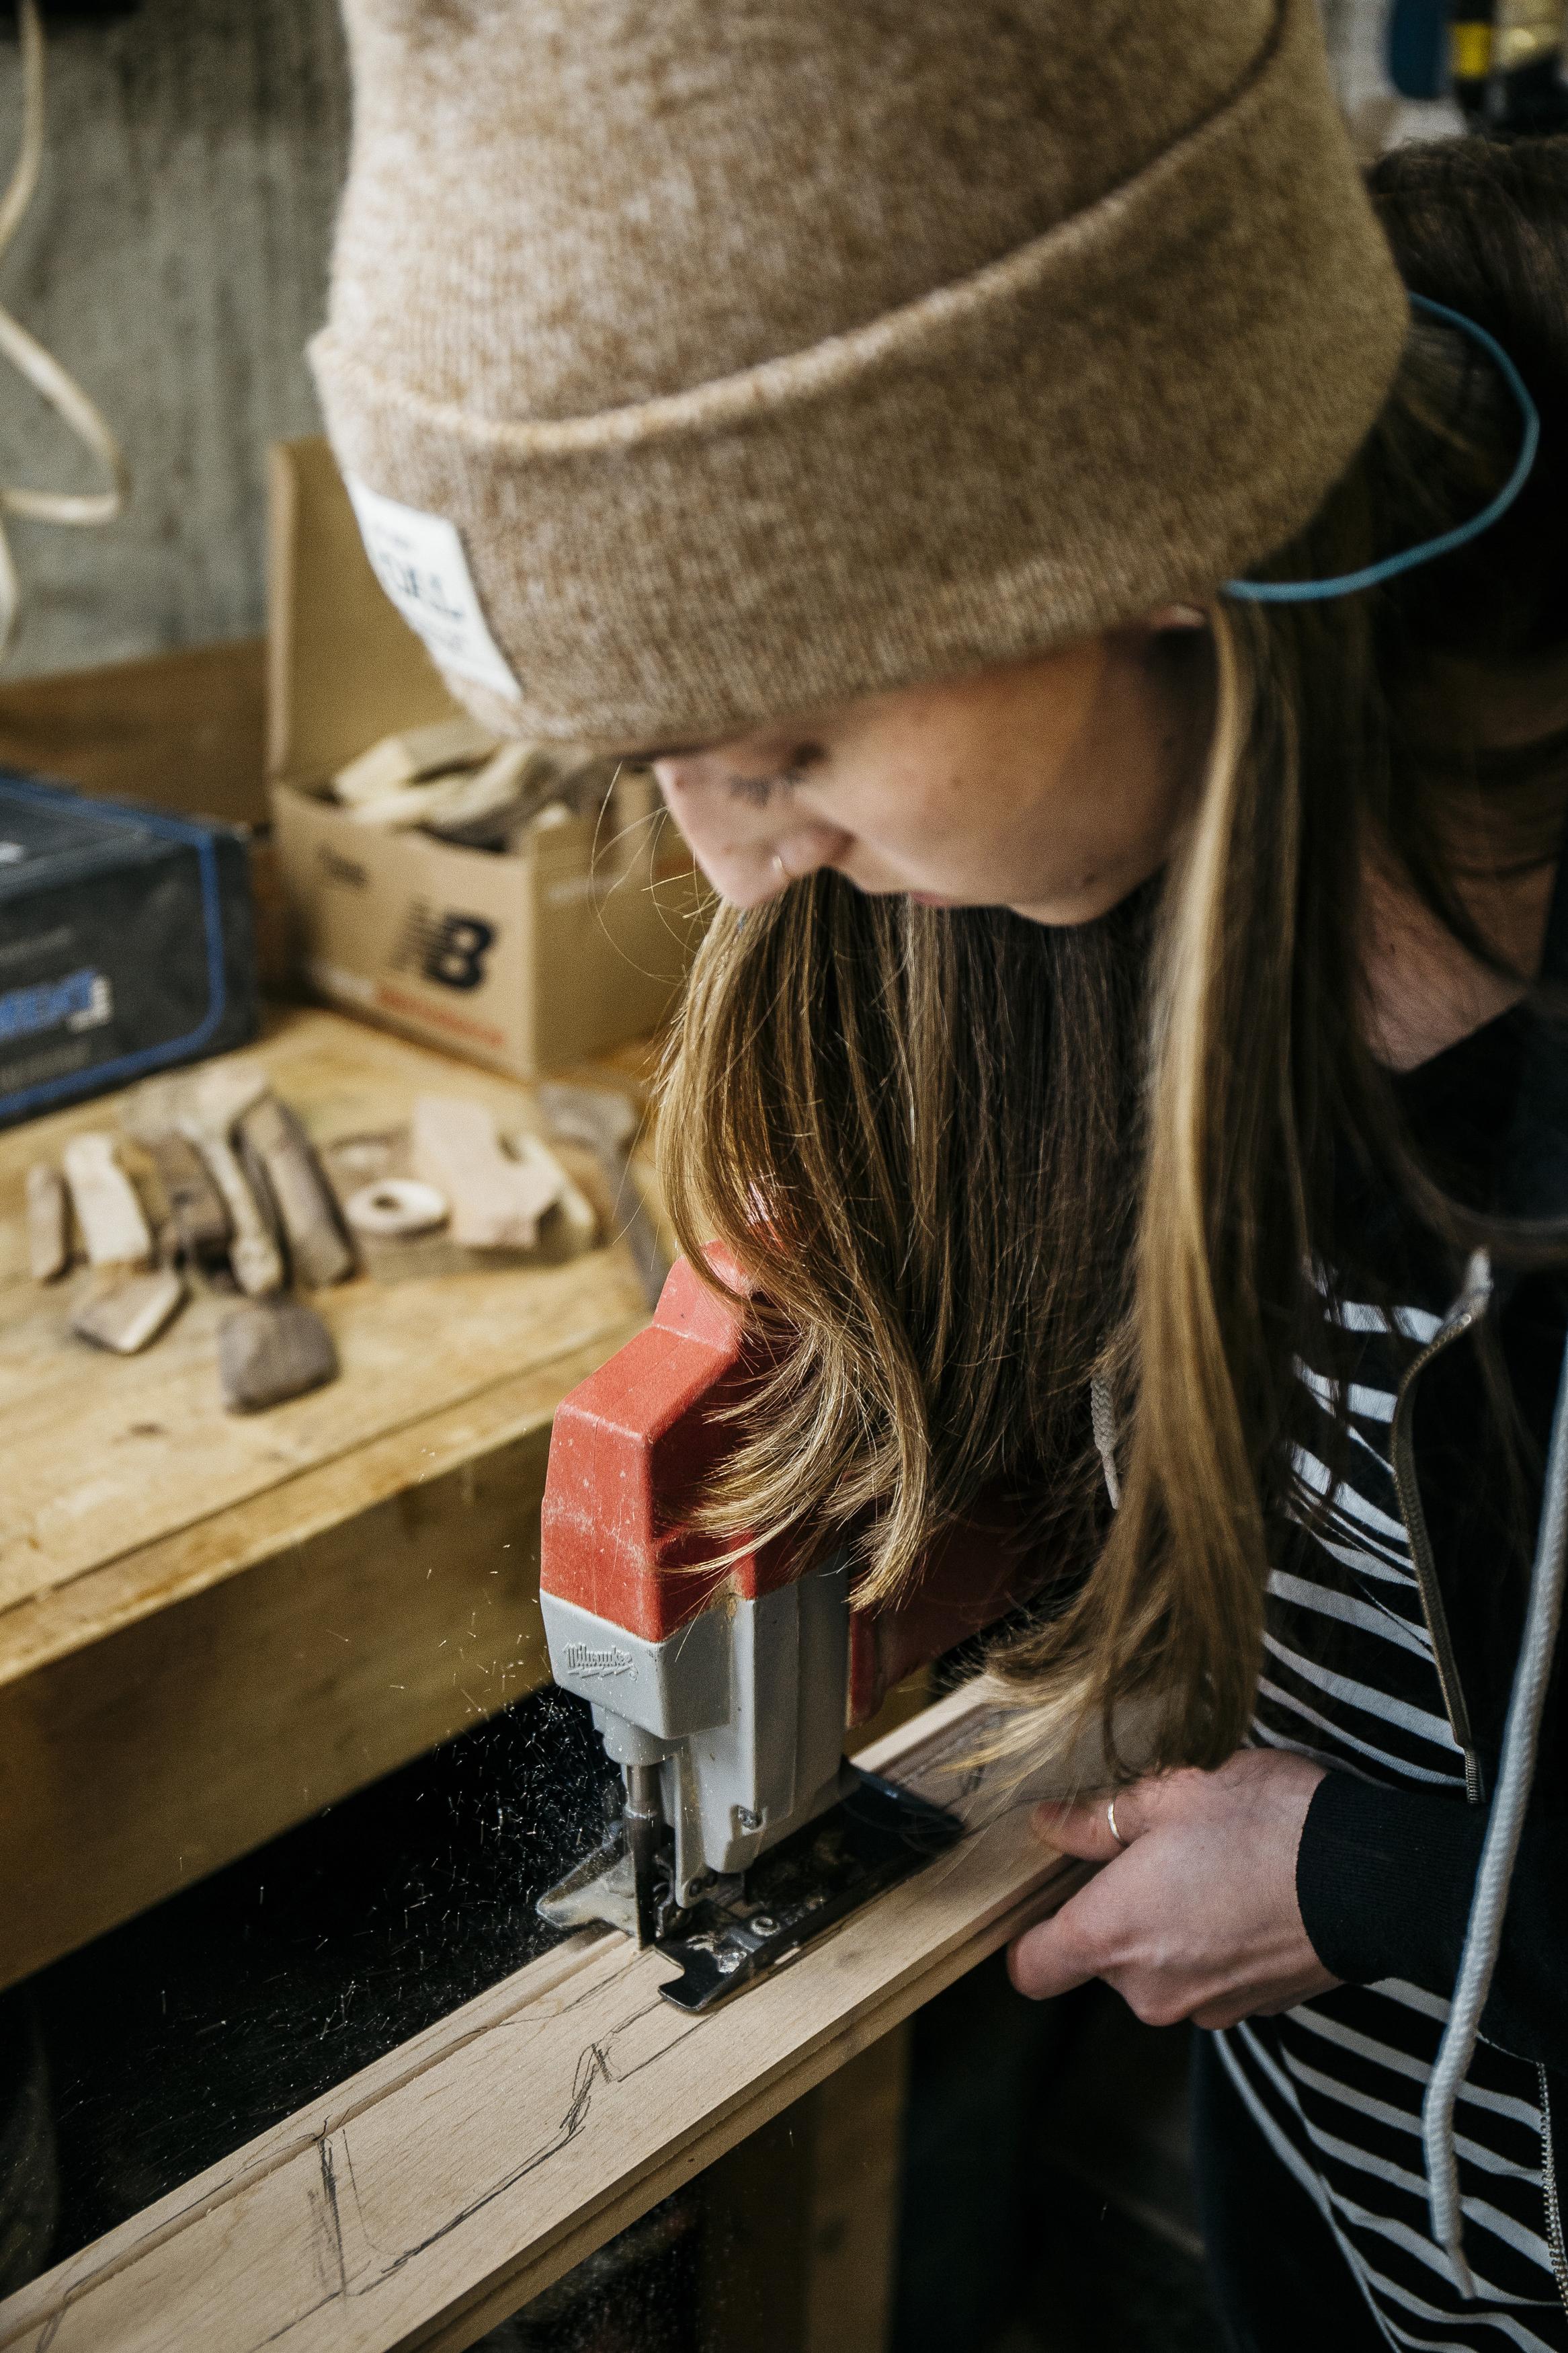 Step 1. Monika cuts out the spatula shape using an electric hand saw.